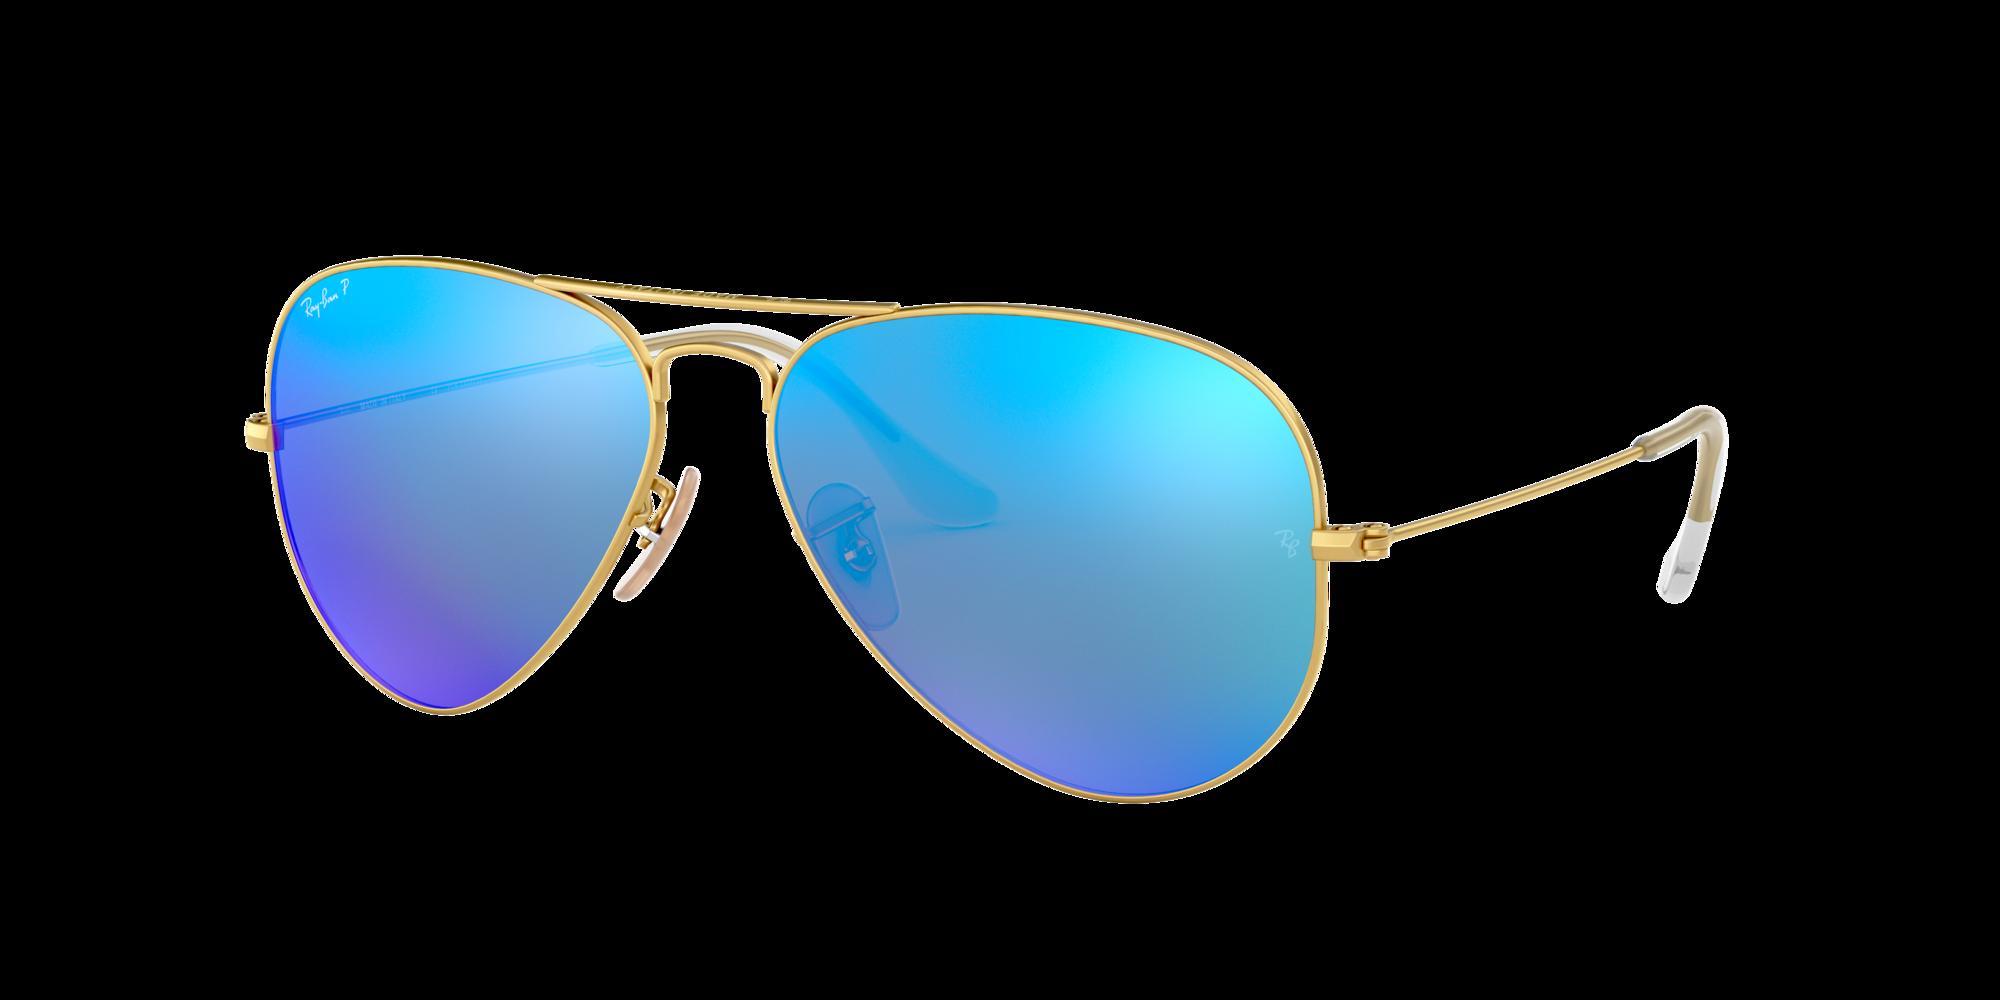 Bullet Sun Ray Crystal Frame Sunglasses Pack of 2 PF2506